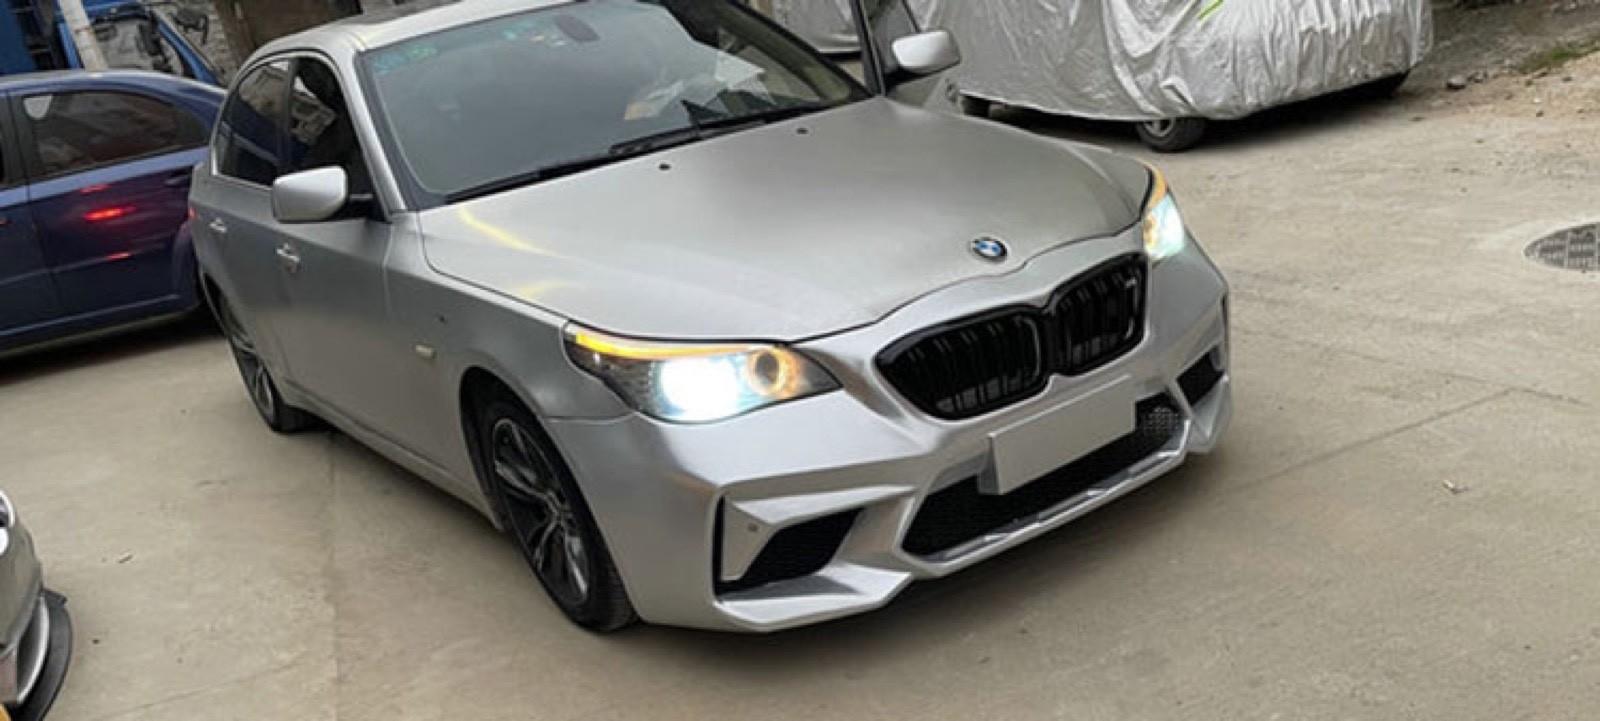 BMW_E60_grille-0005